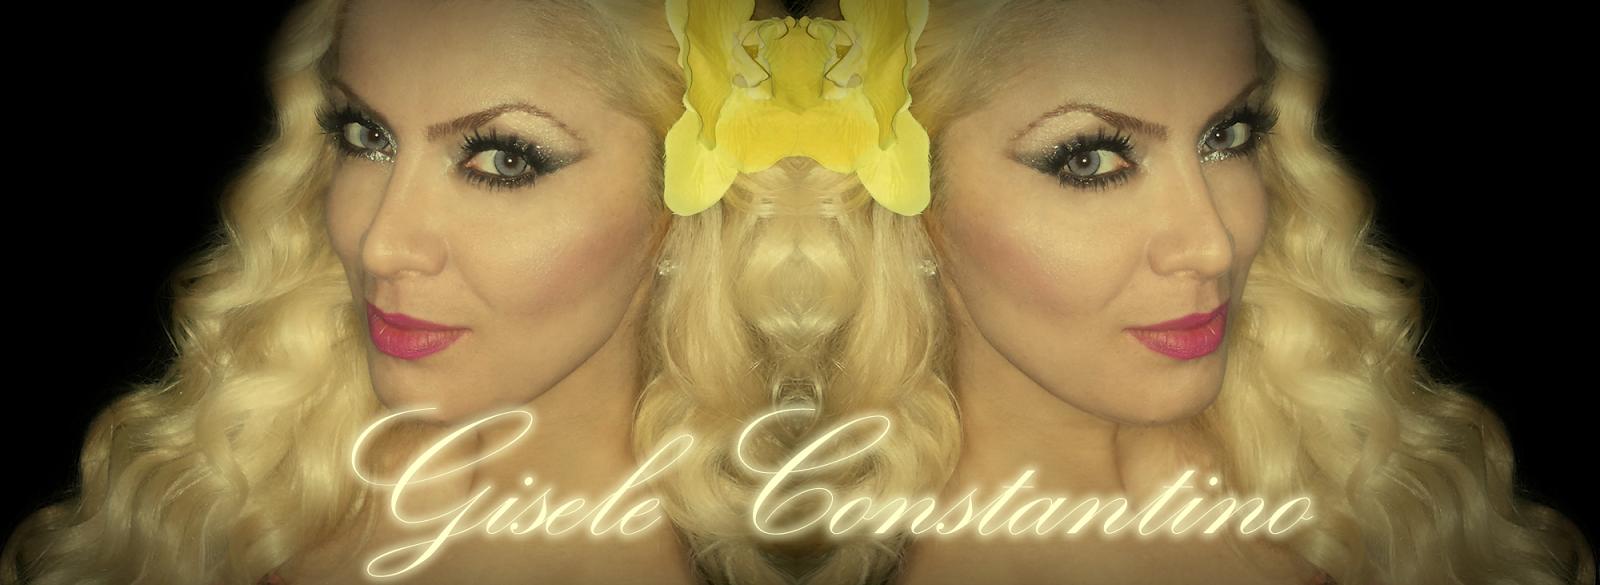 Gisele Constantino